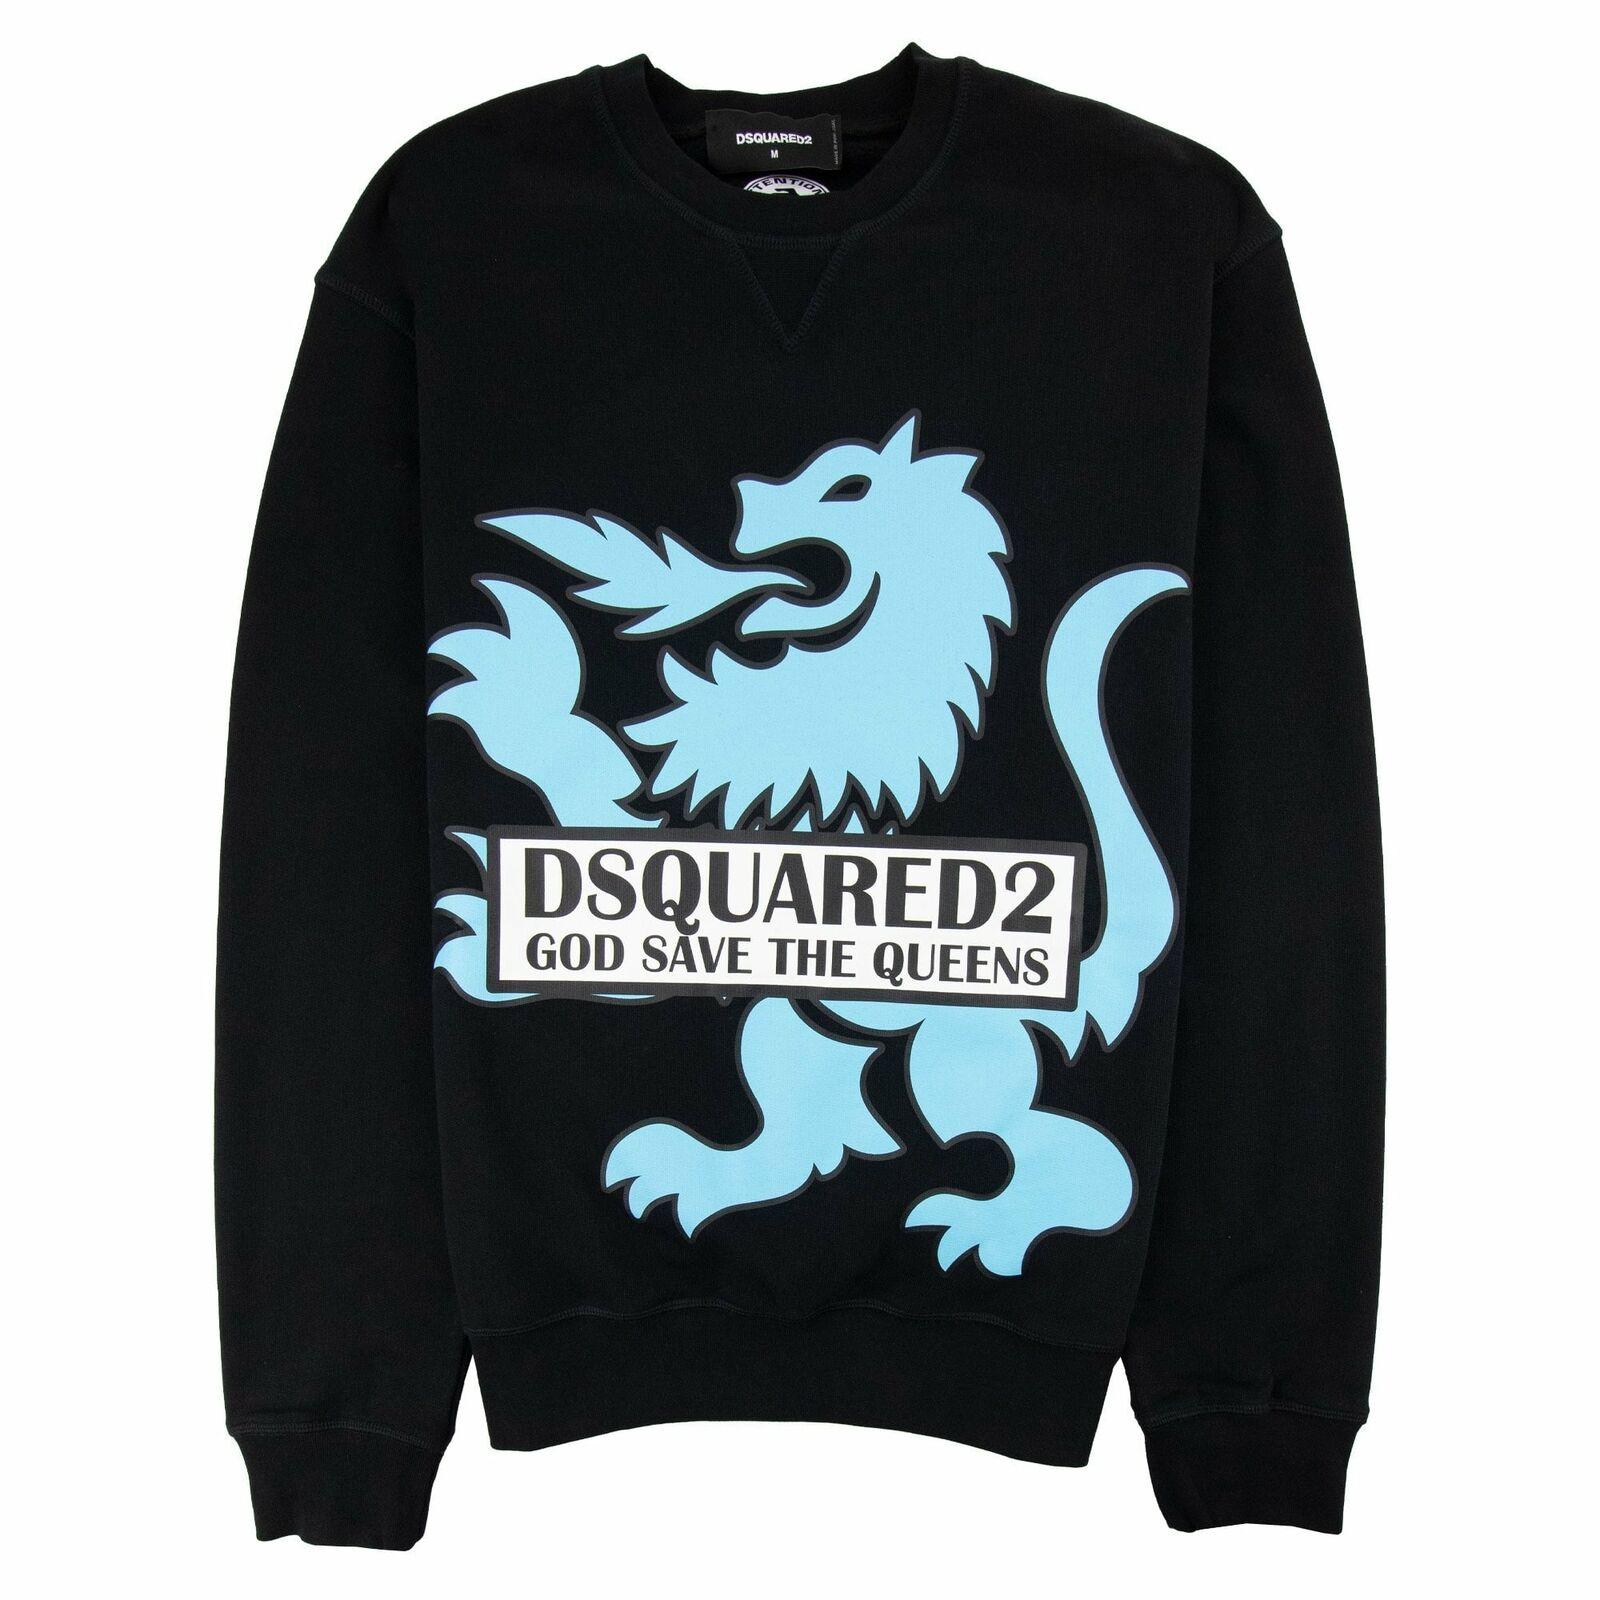 Dsquared2 God Save The Queens Sweatshirt Black